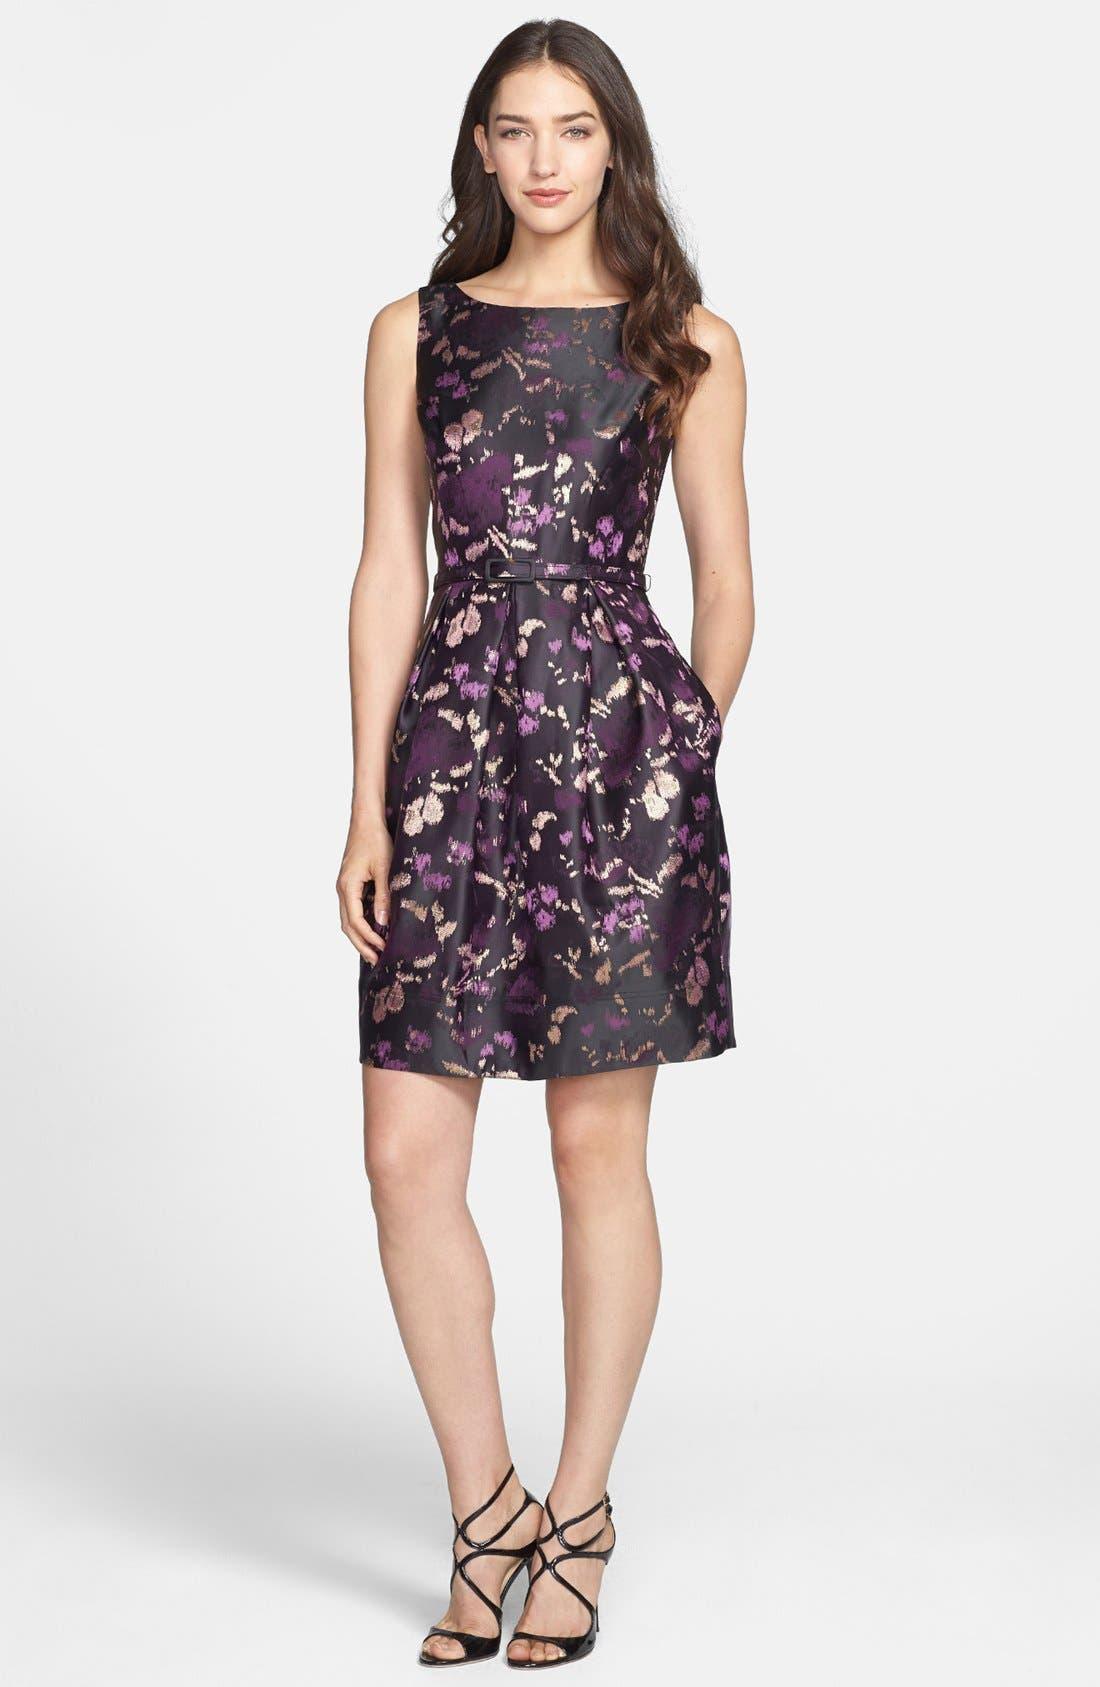 ELIZA J, Brocade Fit & Flare Dress, Main thumbnail 1, color, 500